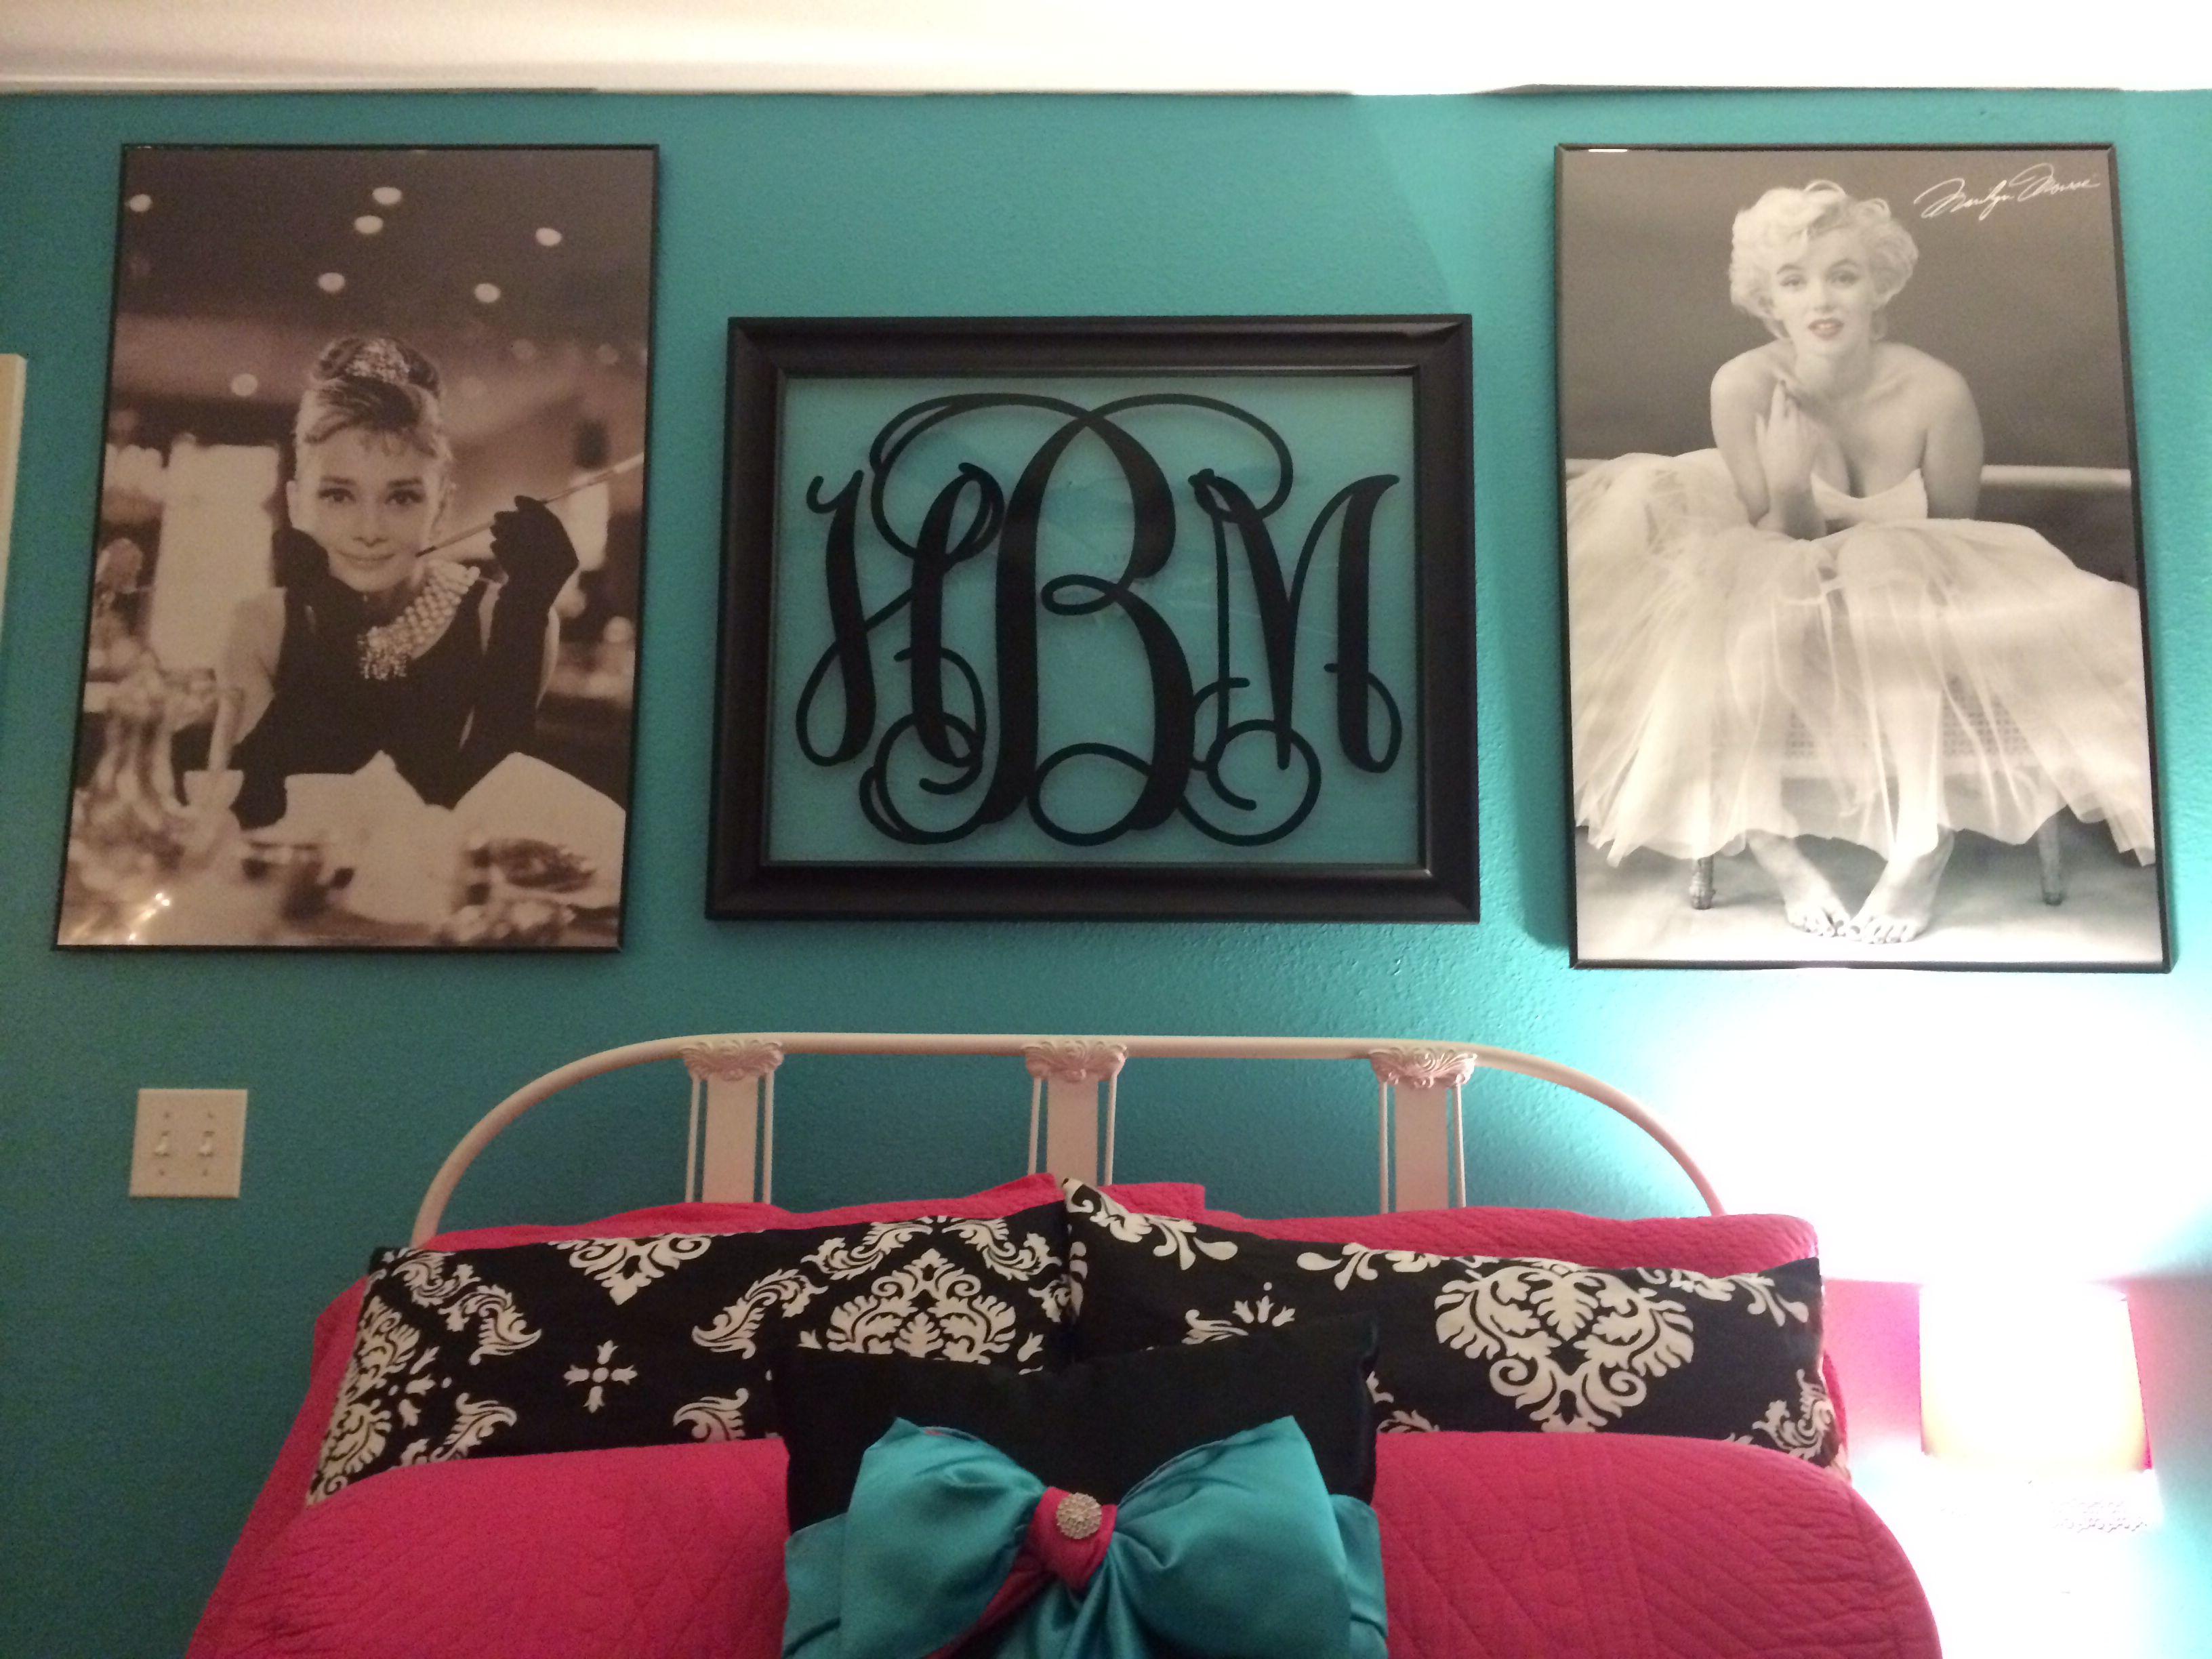 Marilyn Monroe Stuff For Bedroom Bedroom Audrey Hepburn Marilyn Monroe Bedroom Pinterest